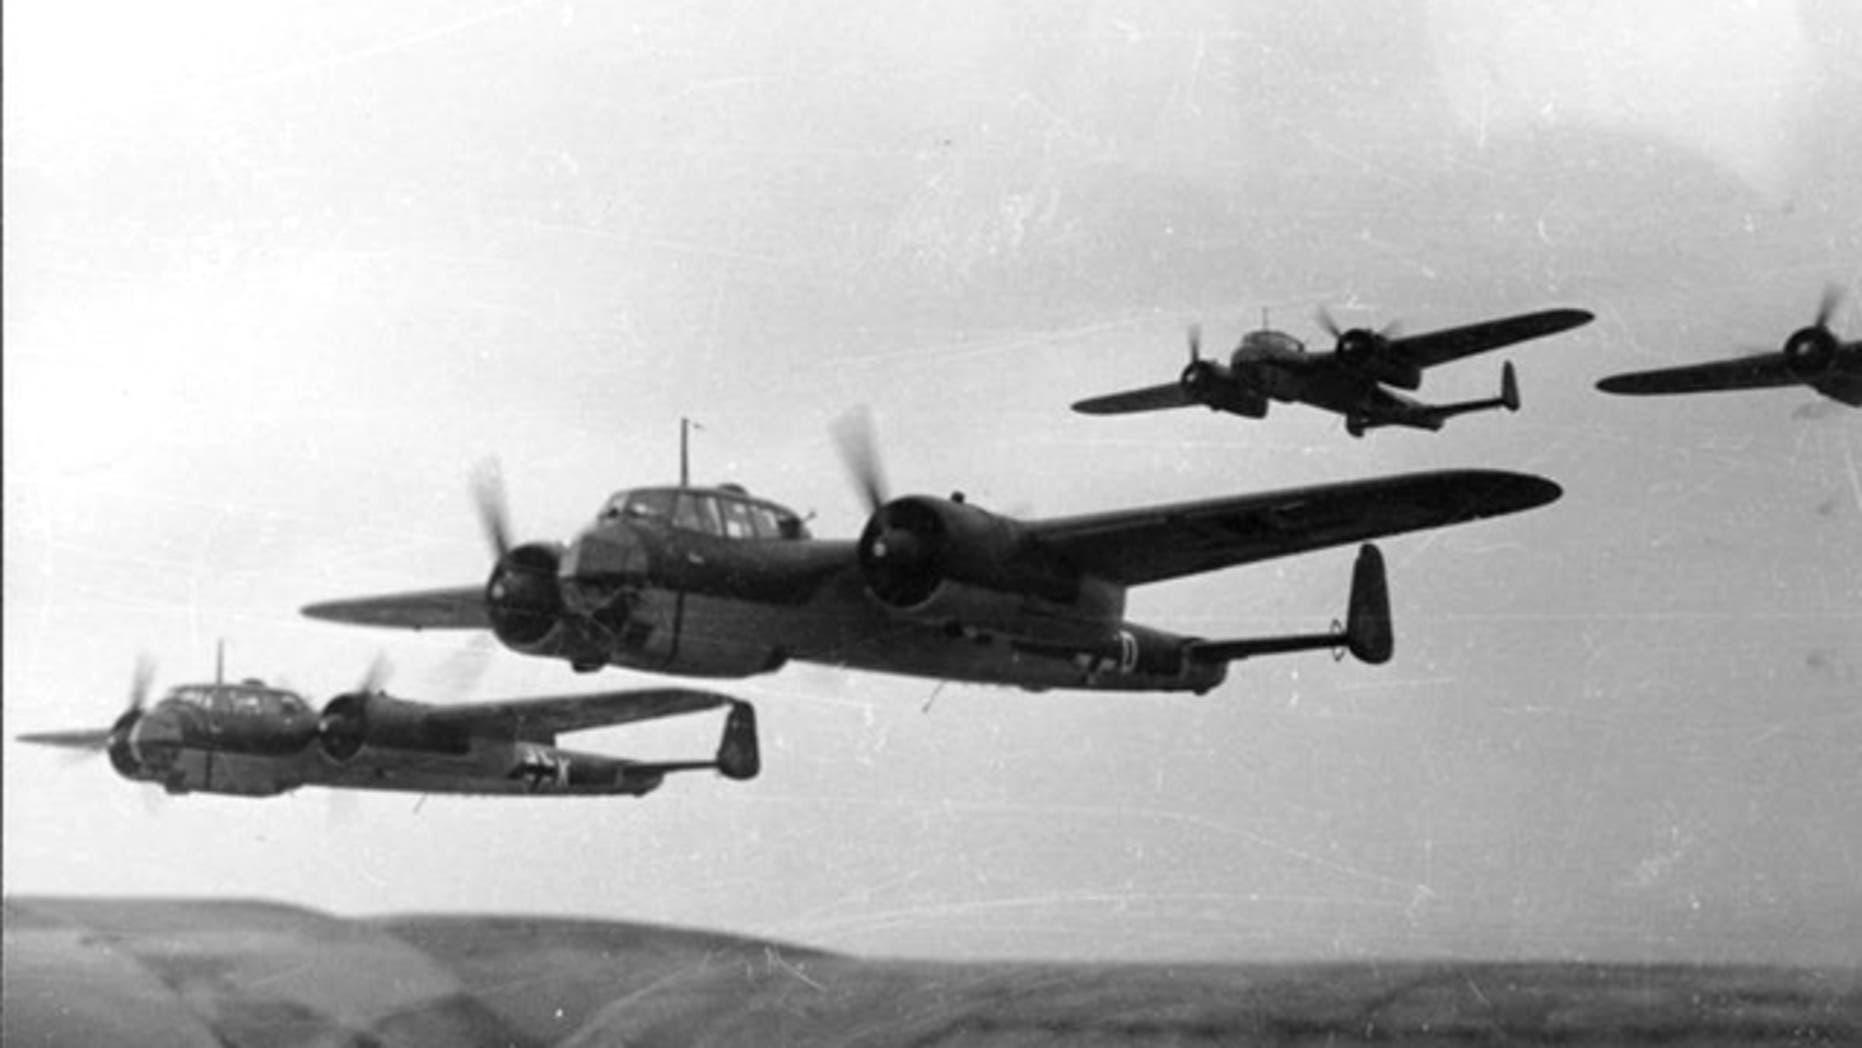 A formation of Dornier Do 17 planes flies in 1940.